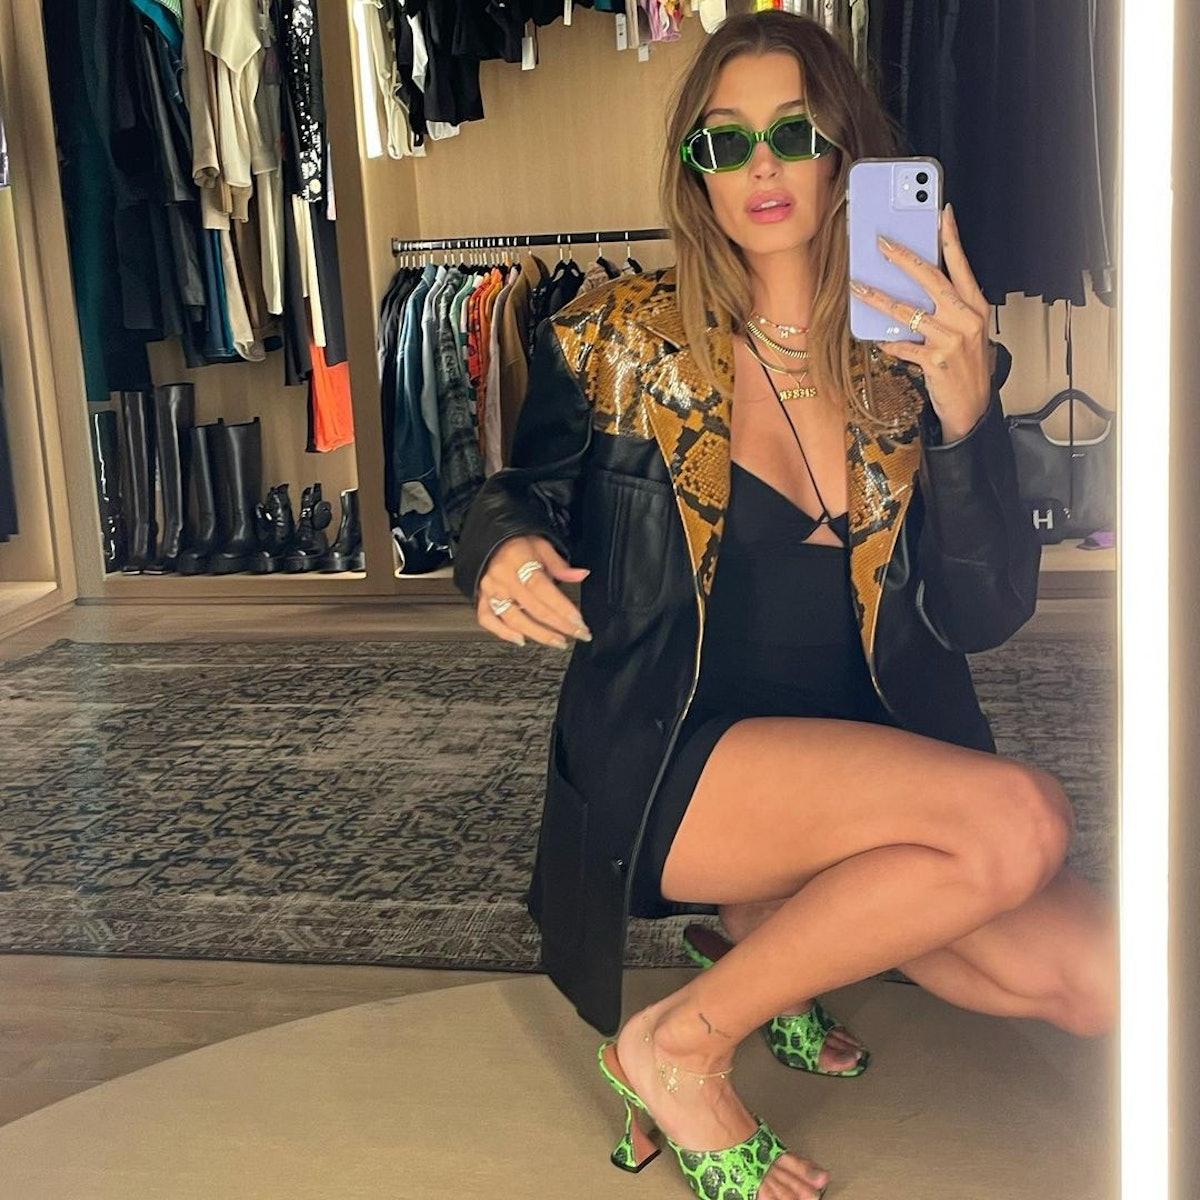 Hailey Bieber taking Instagram mirror selfie with green sunglasses